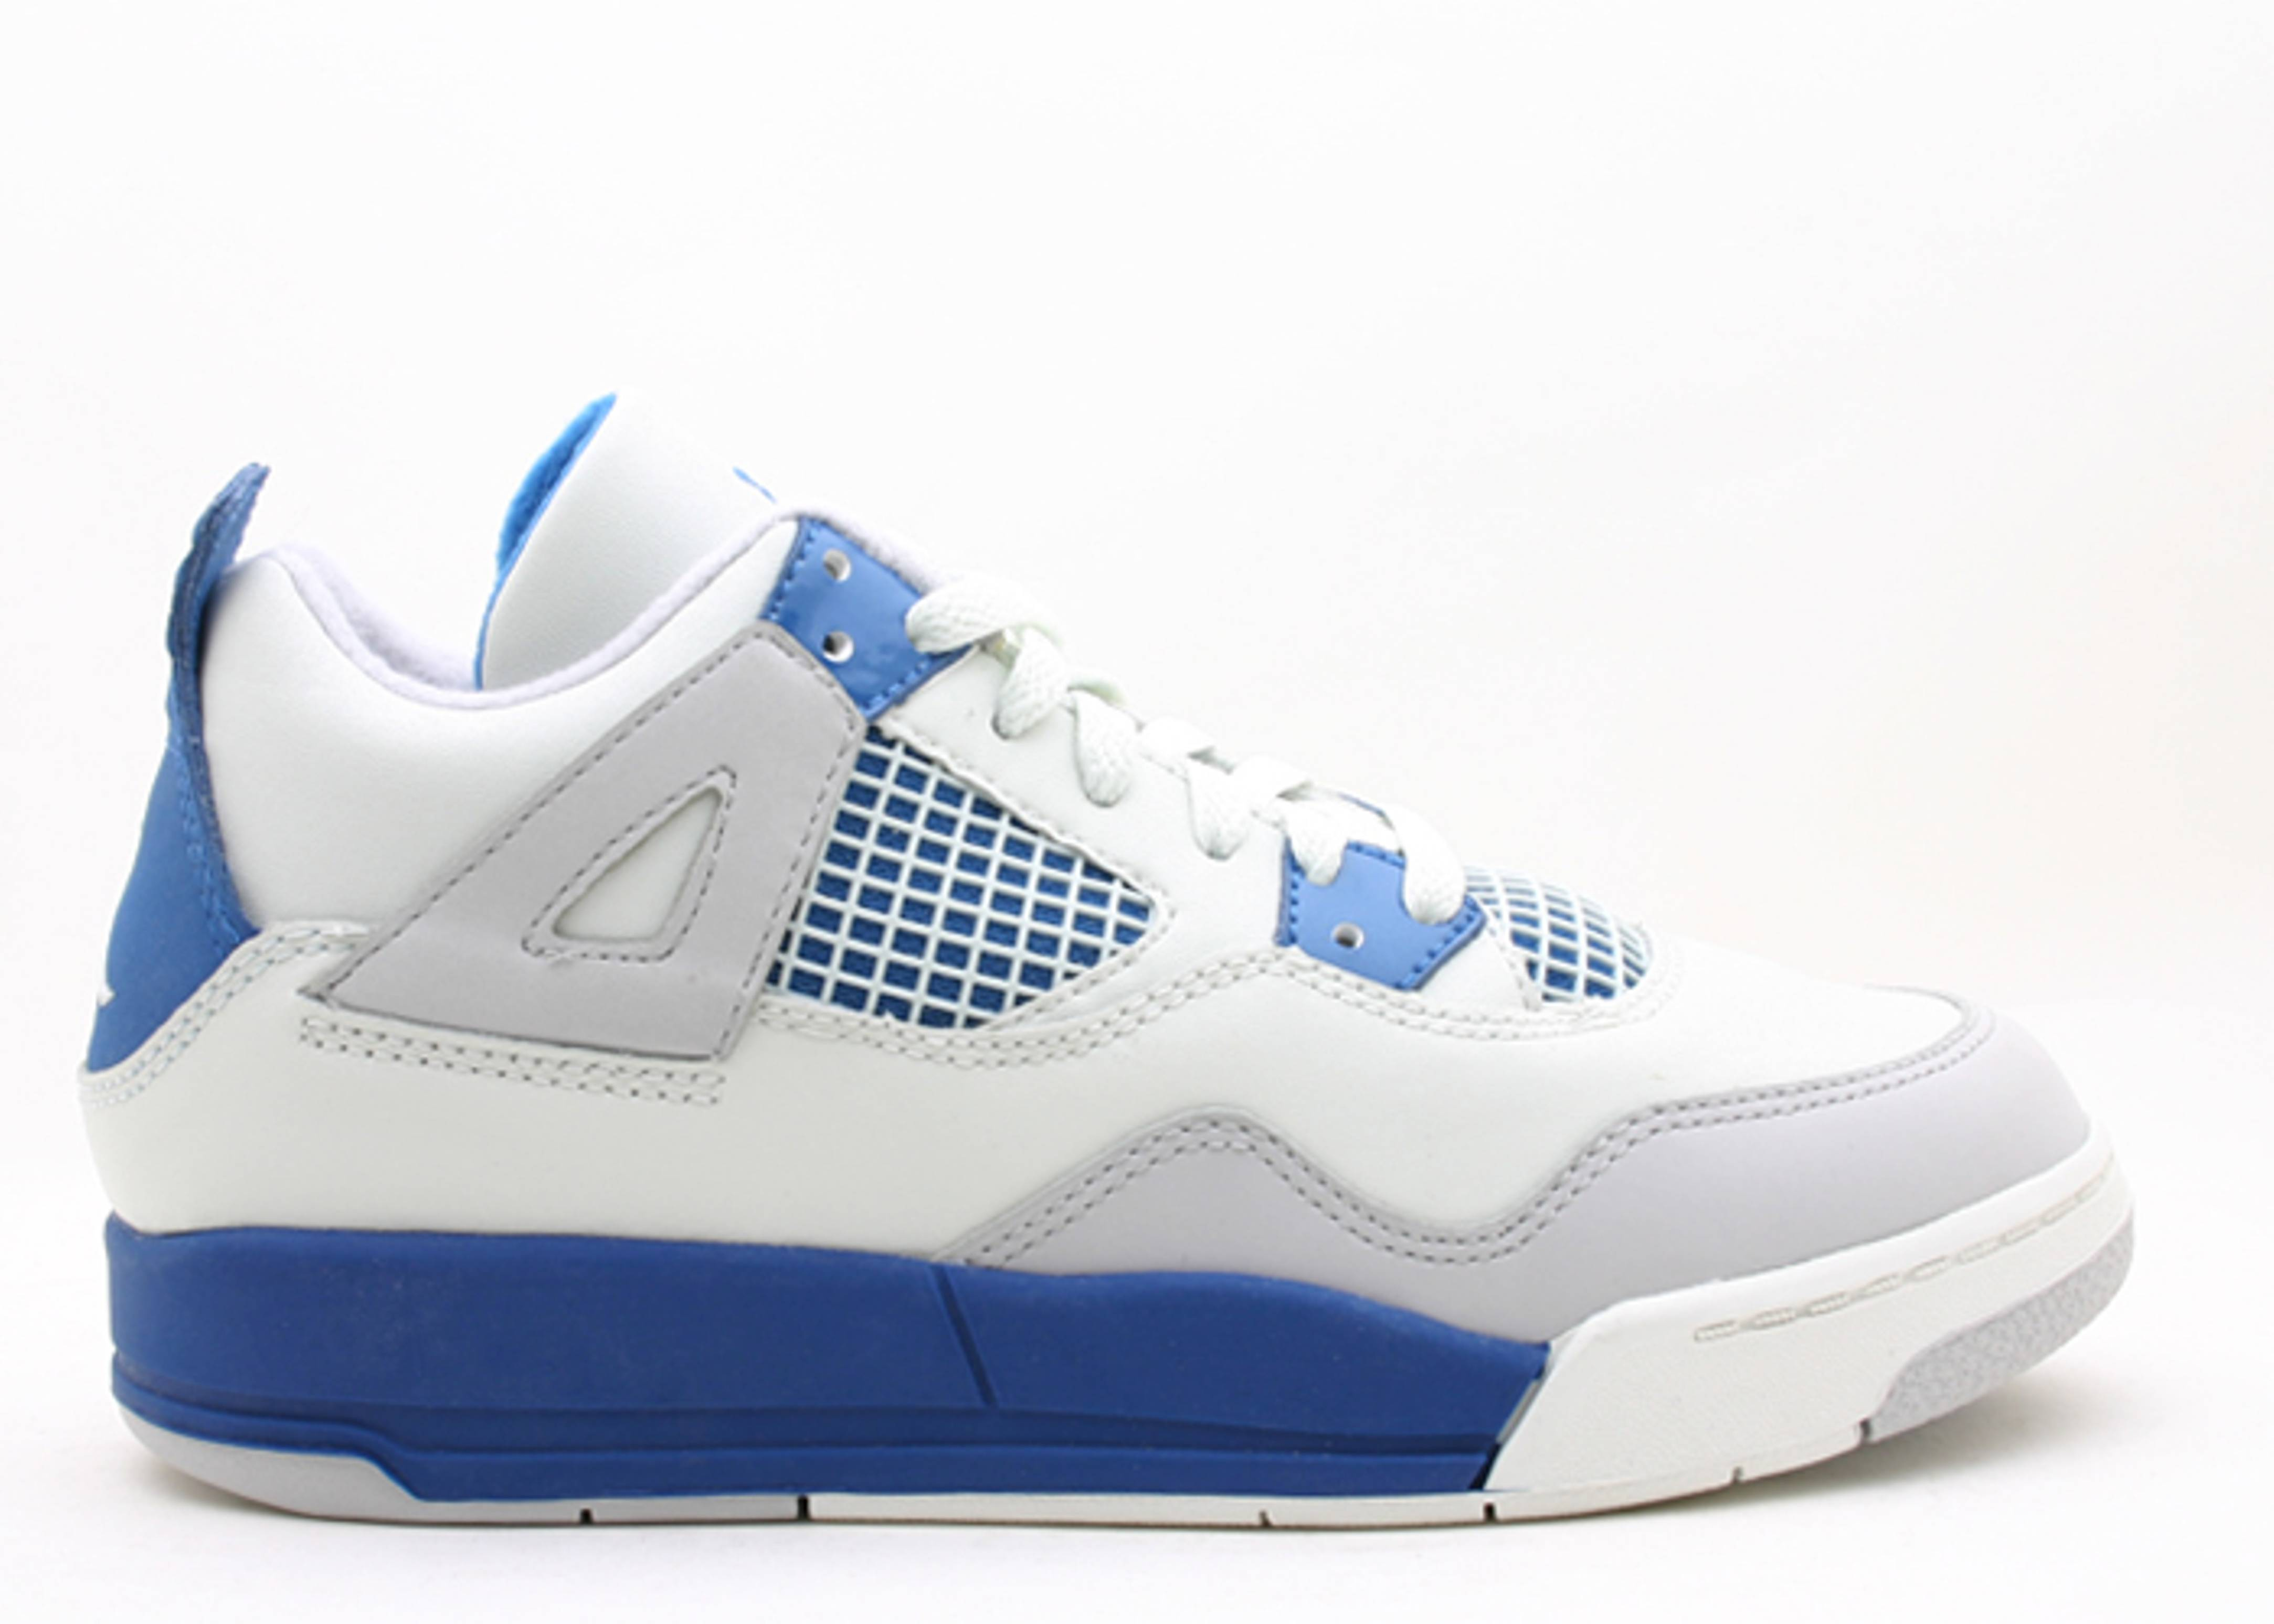 online store 59409 a1531 4 Retro (ps) - Air Jordan - 308499 141 - off white  military blue-n ...